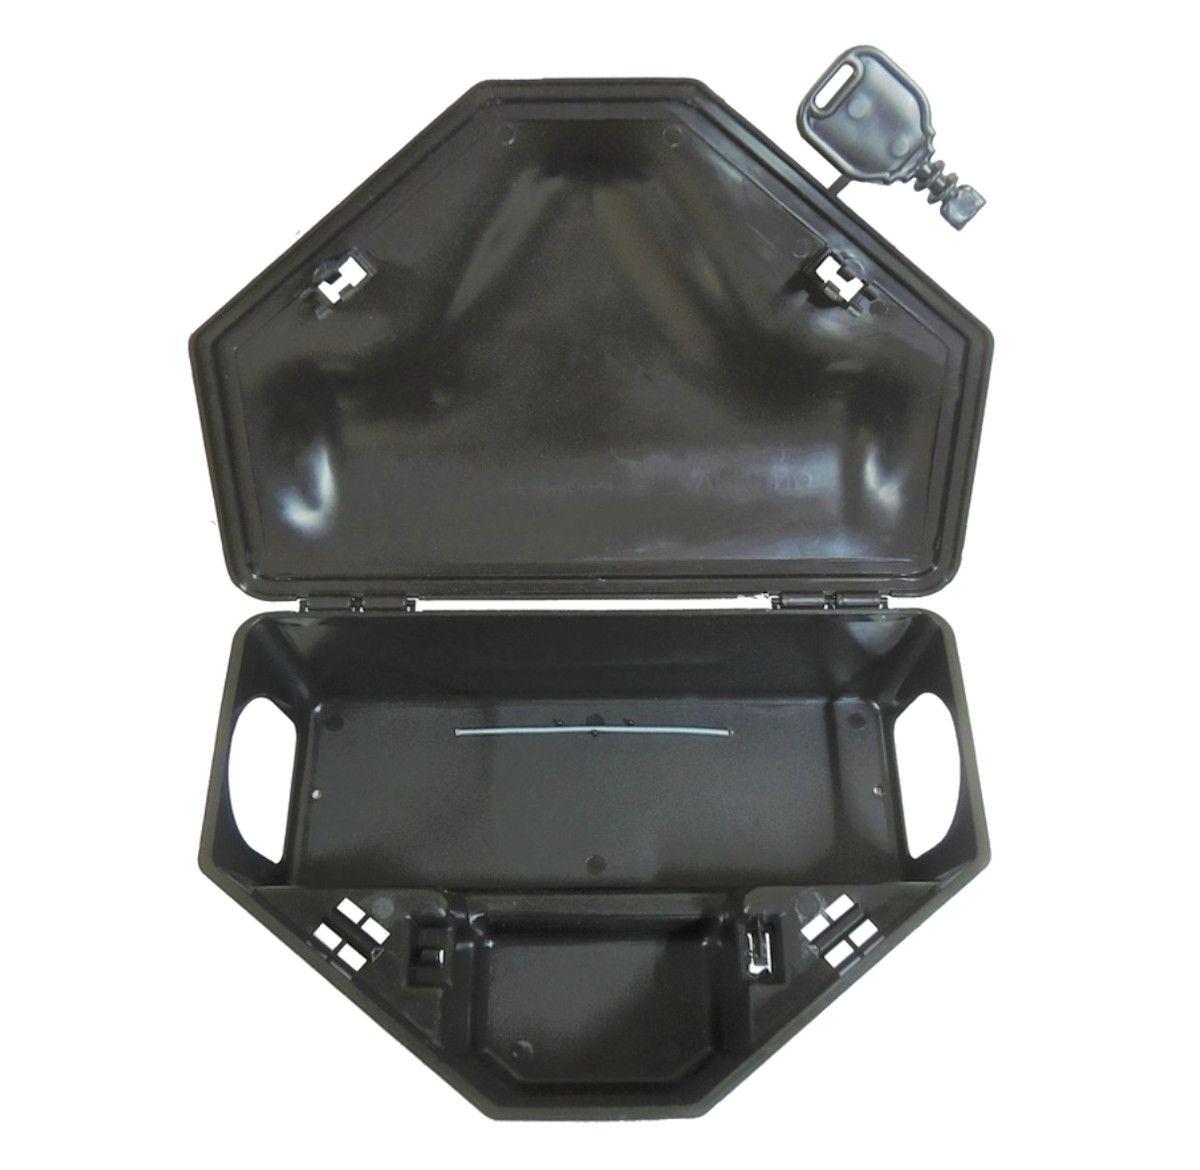 Kit 71 Porta Isca Com 2 Chaves - Duplo Travamento